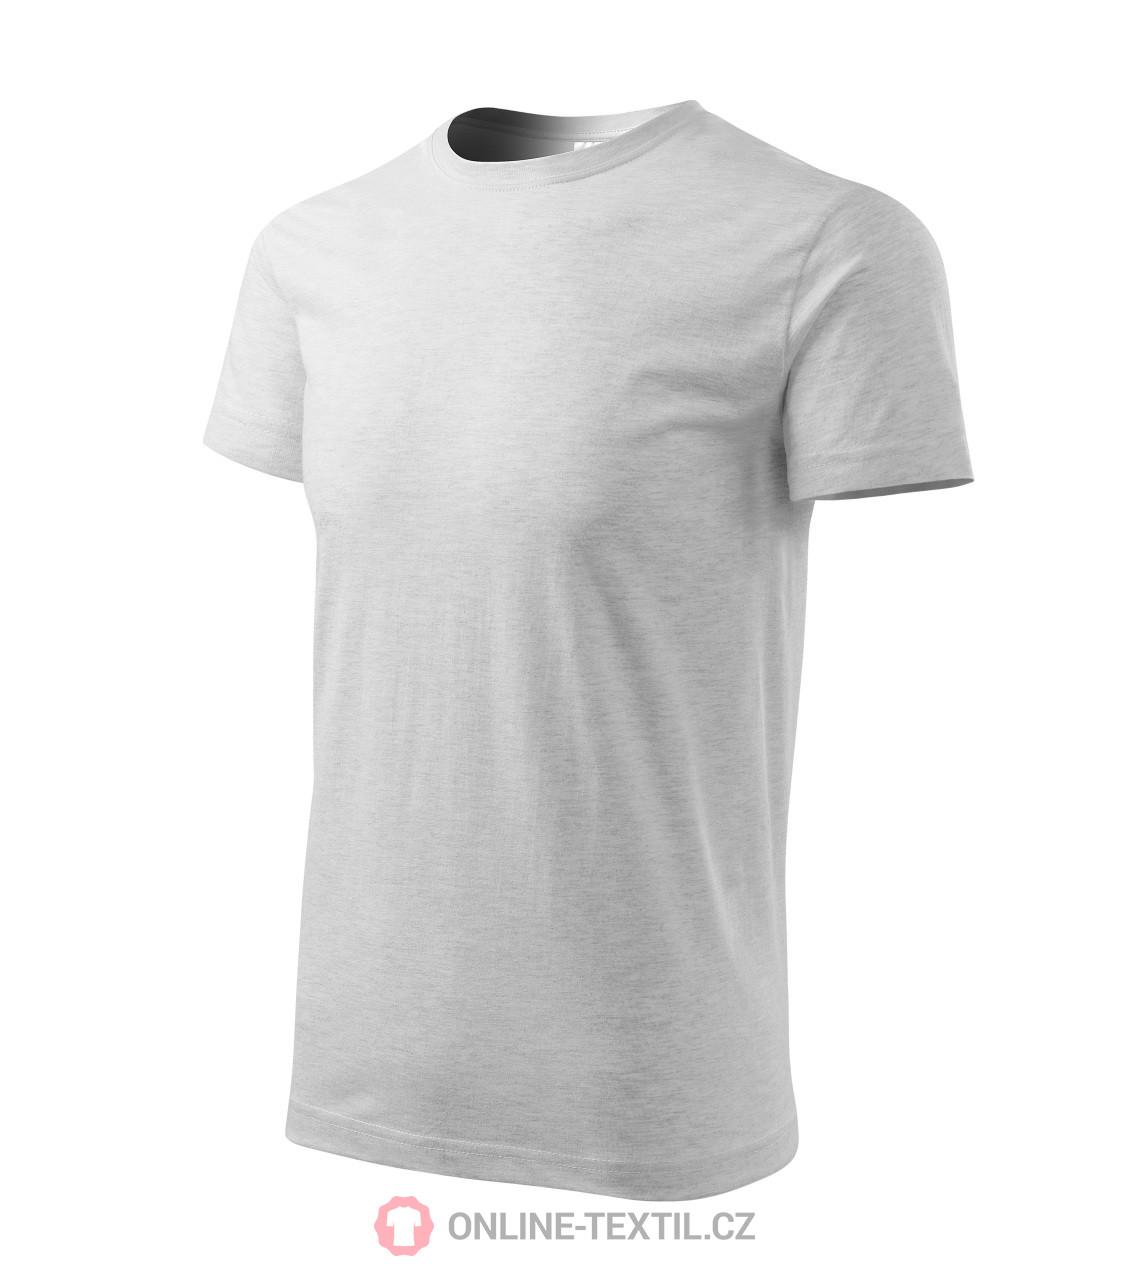 946c846d0d6b ADLER CZECH Heavy New tričko unisex 13A - svetlosivý melír z ...